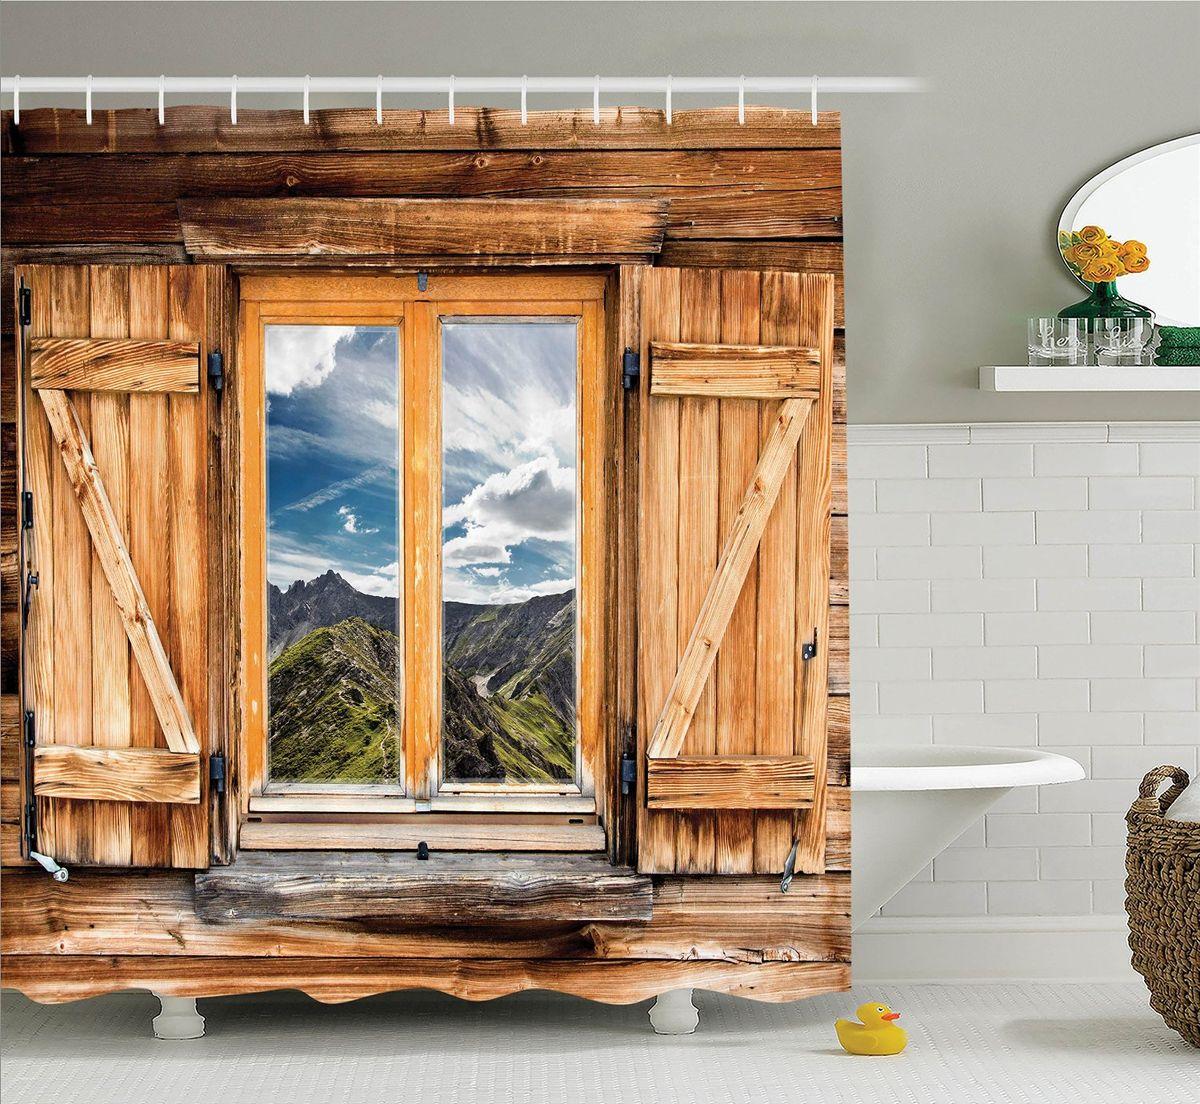 Штора для ванной комнаты Magic Lady Старое окошко, 180 х 200 см штора для ванной комнаты magic lady планеты  180 х 200 см